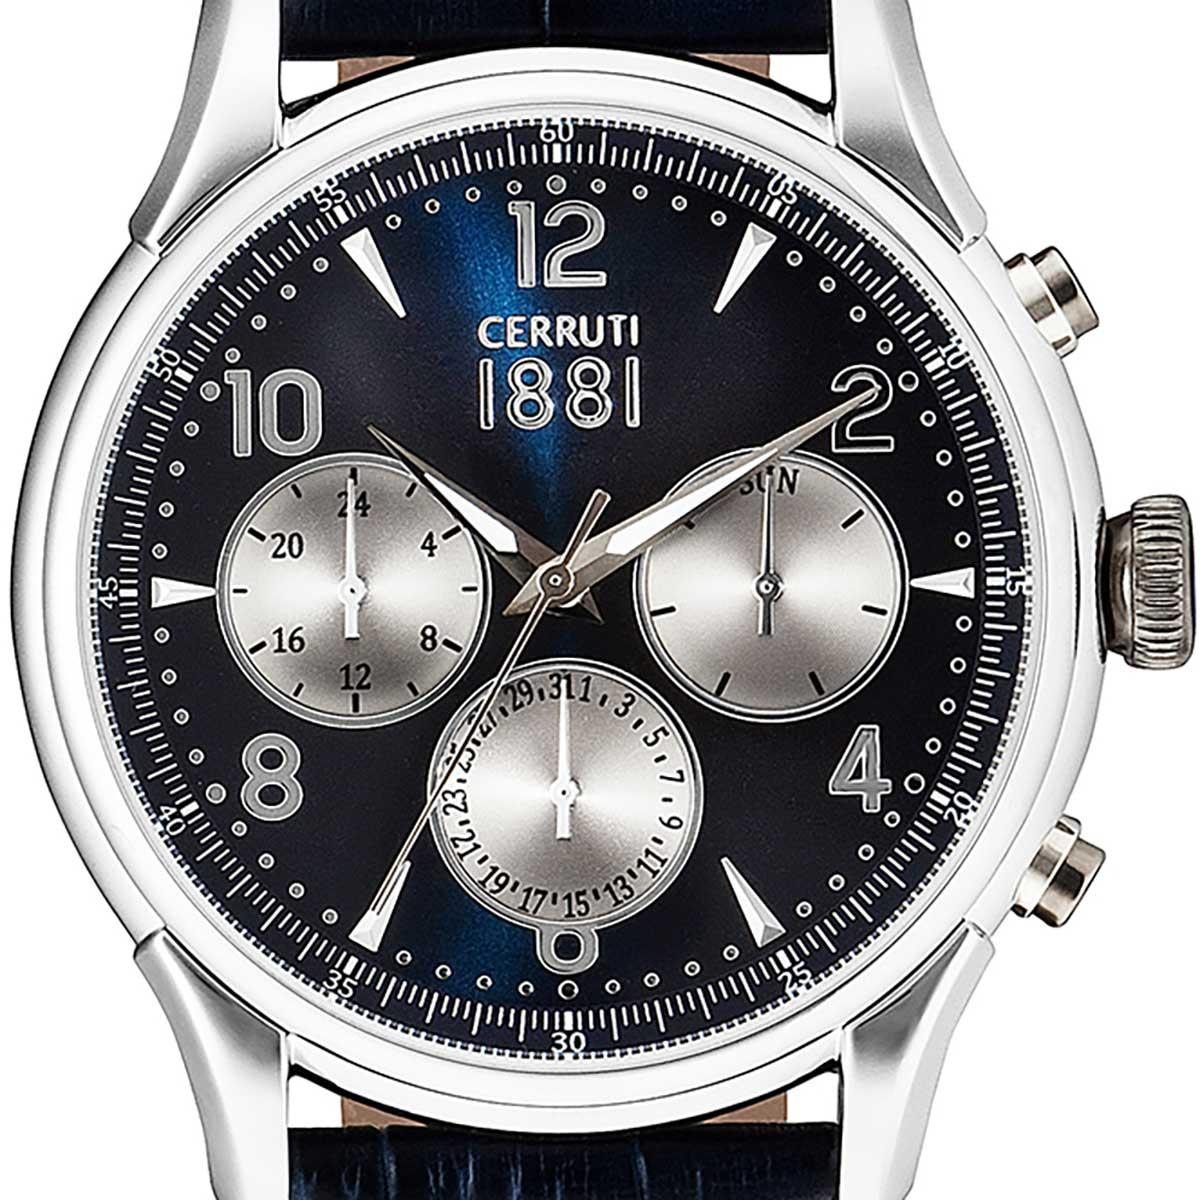 CERRUTI 1881 チェルッティ1881 電池式クォーツ 腕時計 [CRA107SN03BL] 並行輸入品 ネイビー(紺)